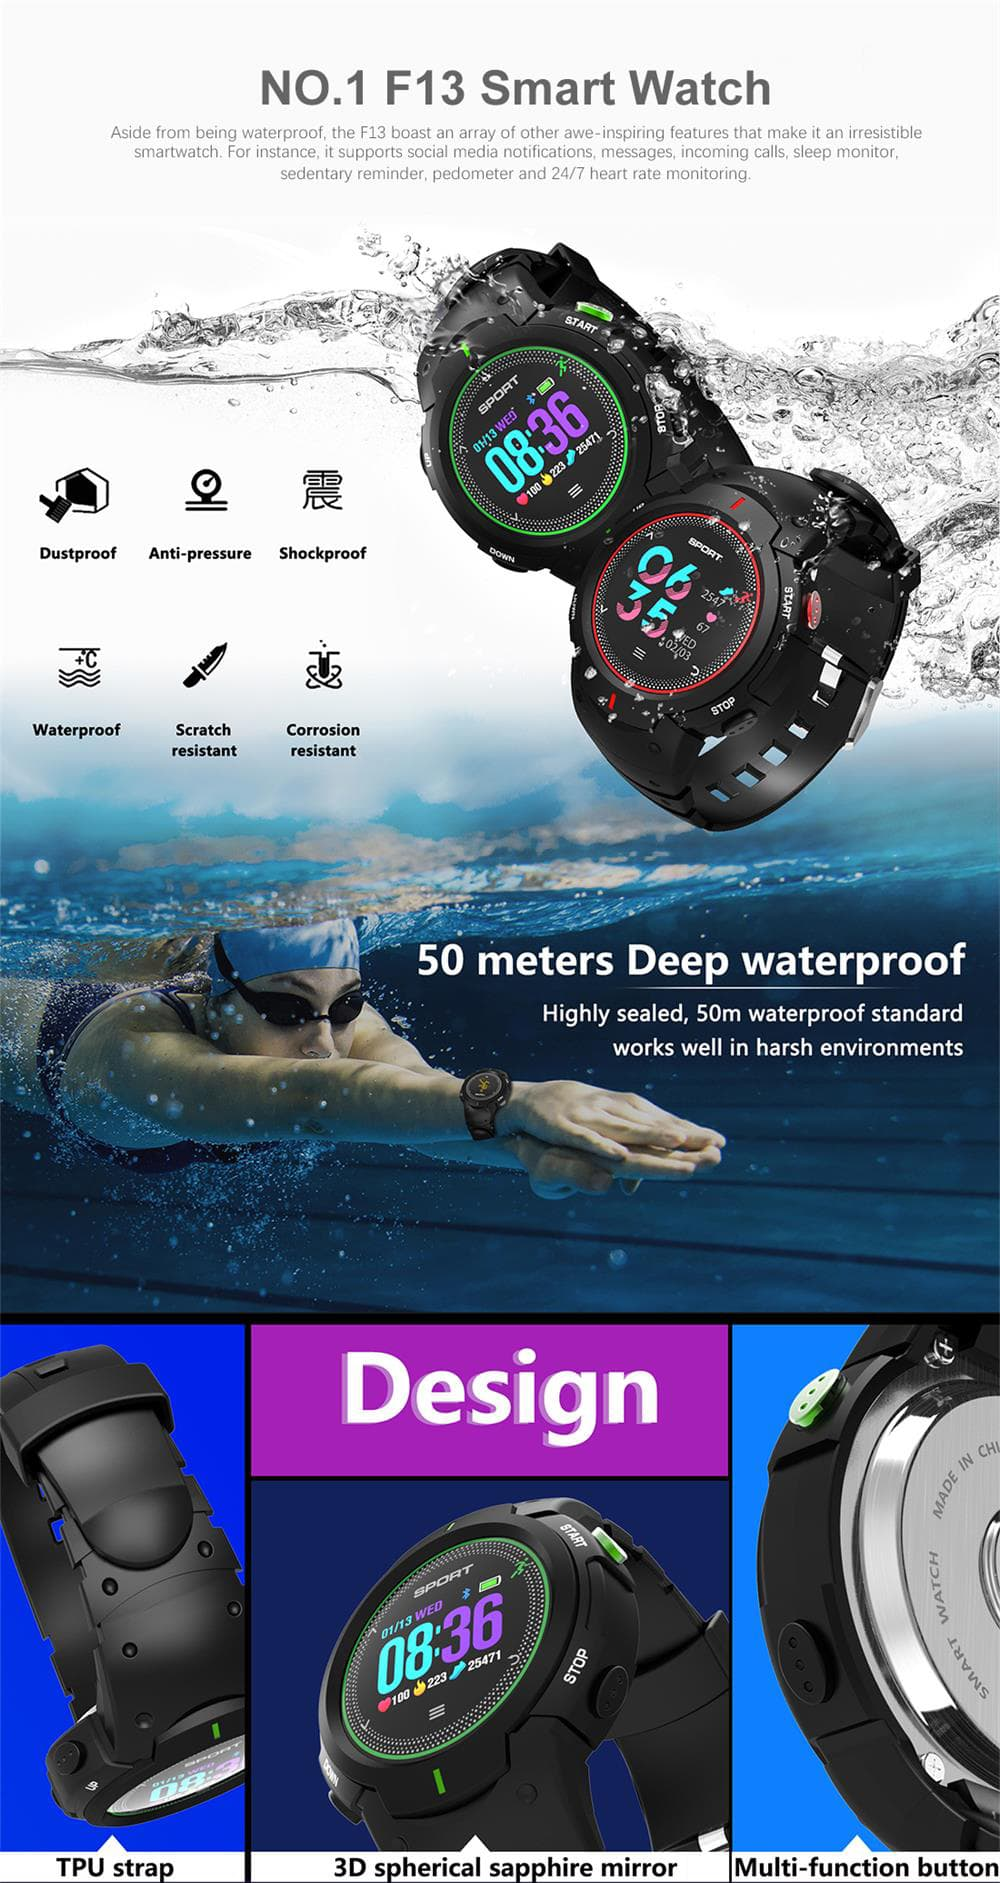 no.1 f13 smartwatch